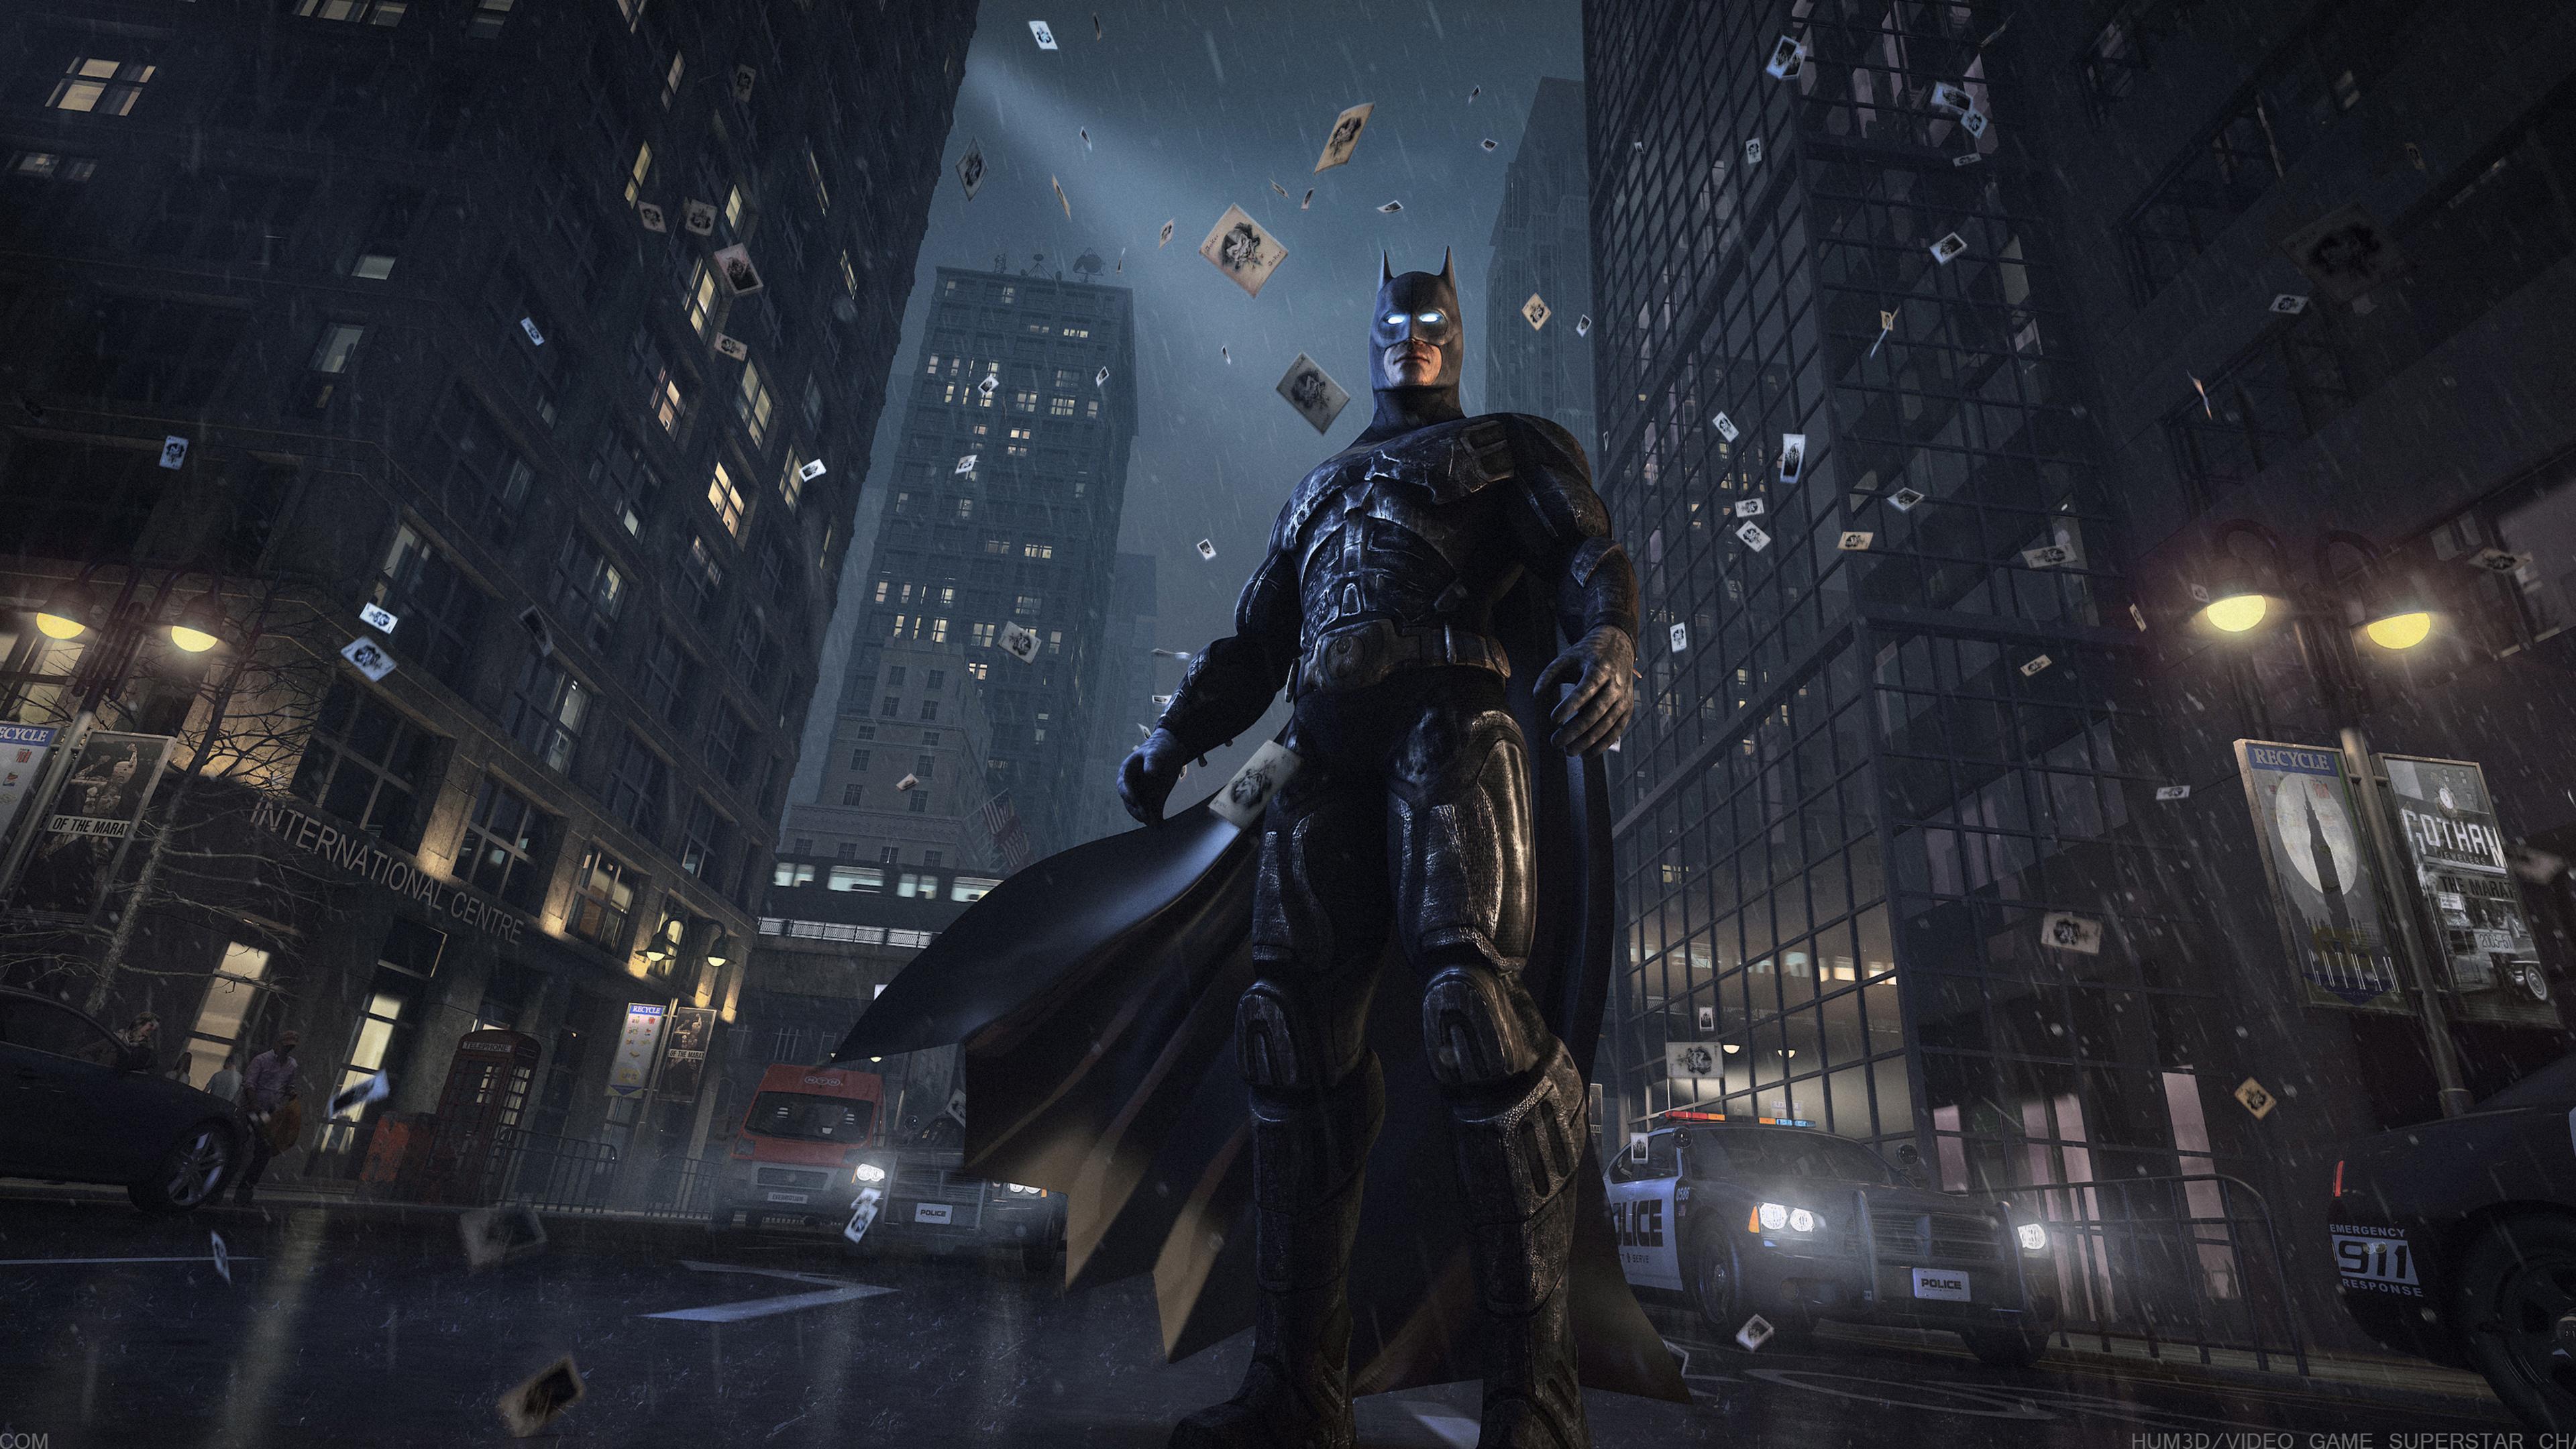 batman watching gotham city 1539978736 - Batman Watching Gotham City - superheroes wallpapers, hd-wallpapers, batman wallpapers, 4k-wallpapers